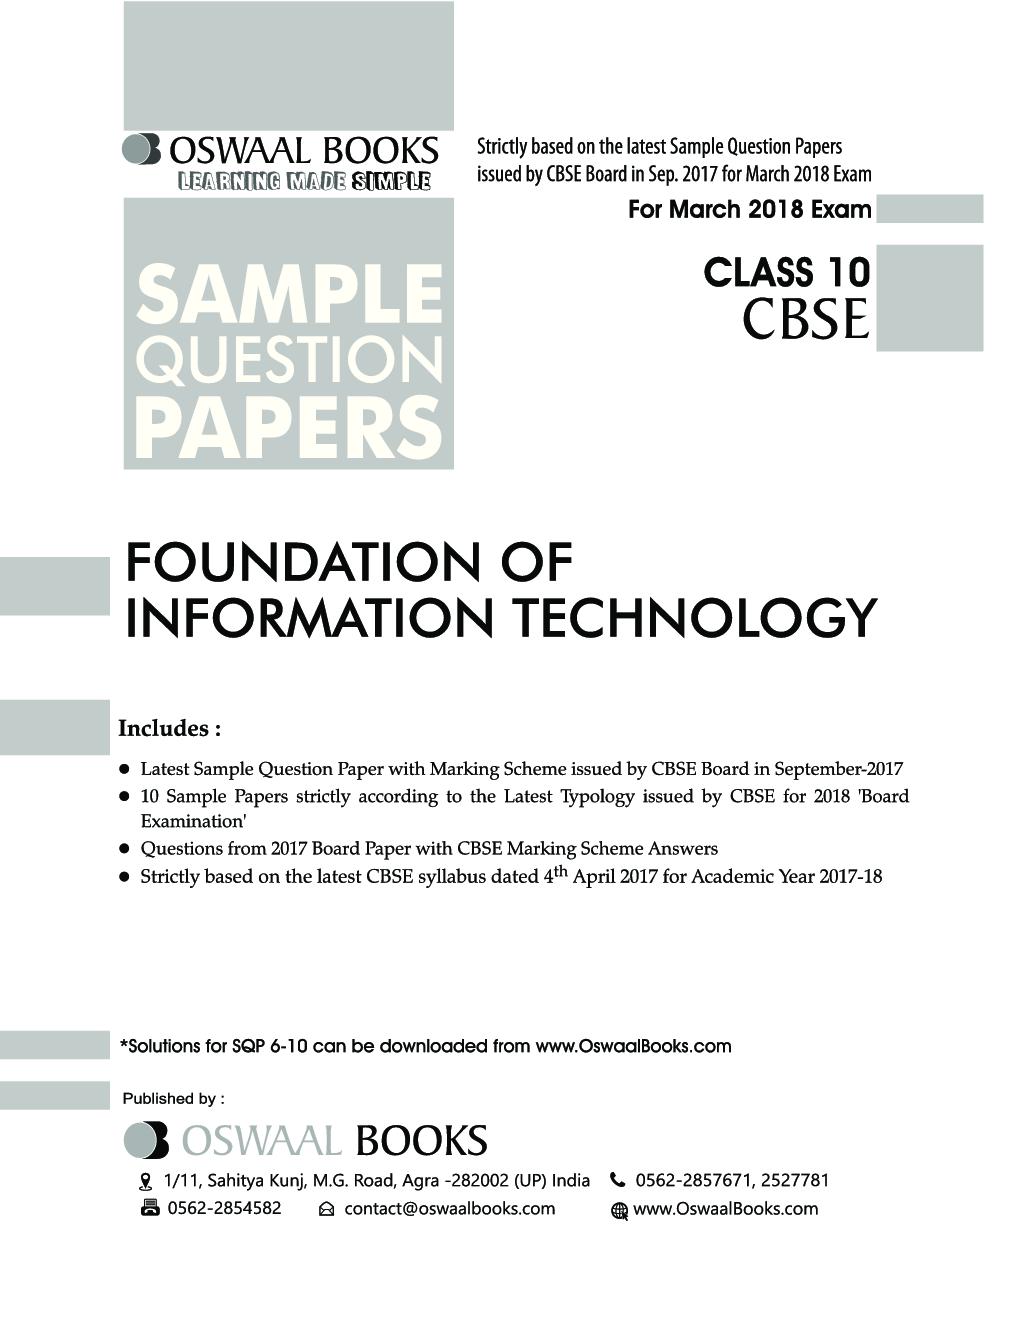 karnataka sslc midterm question papers 2012